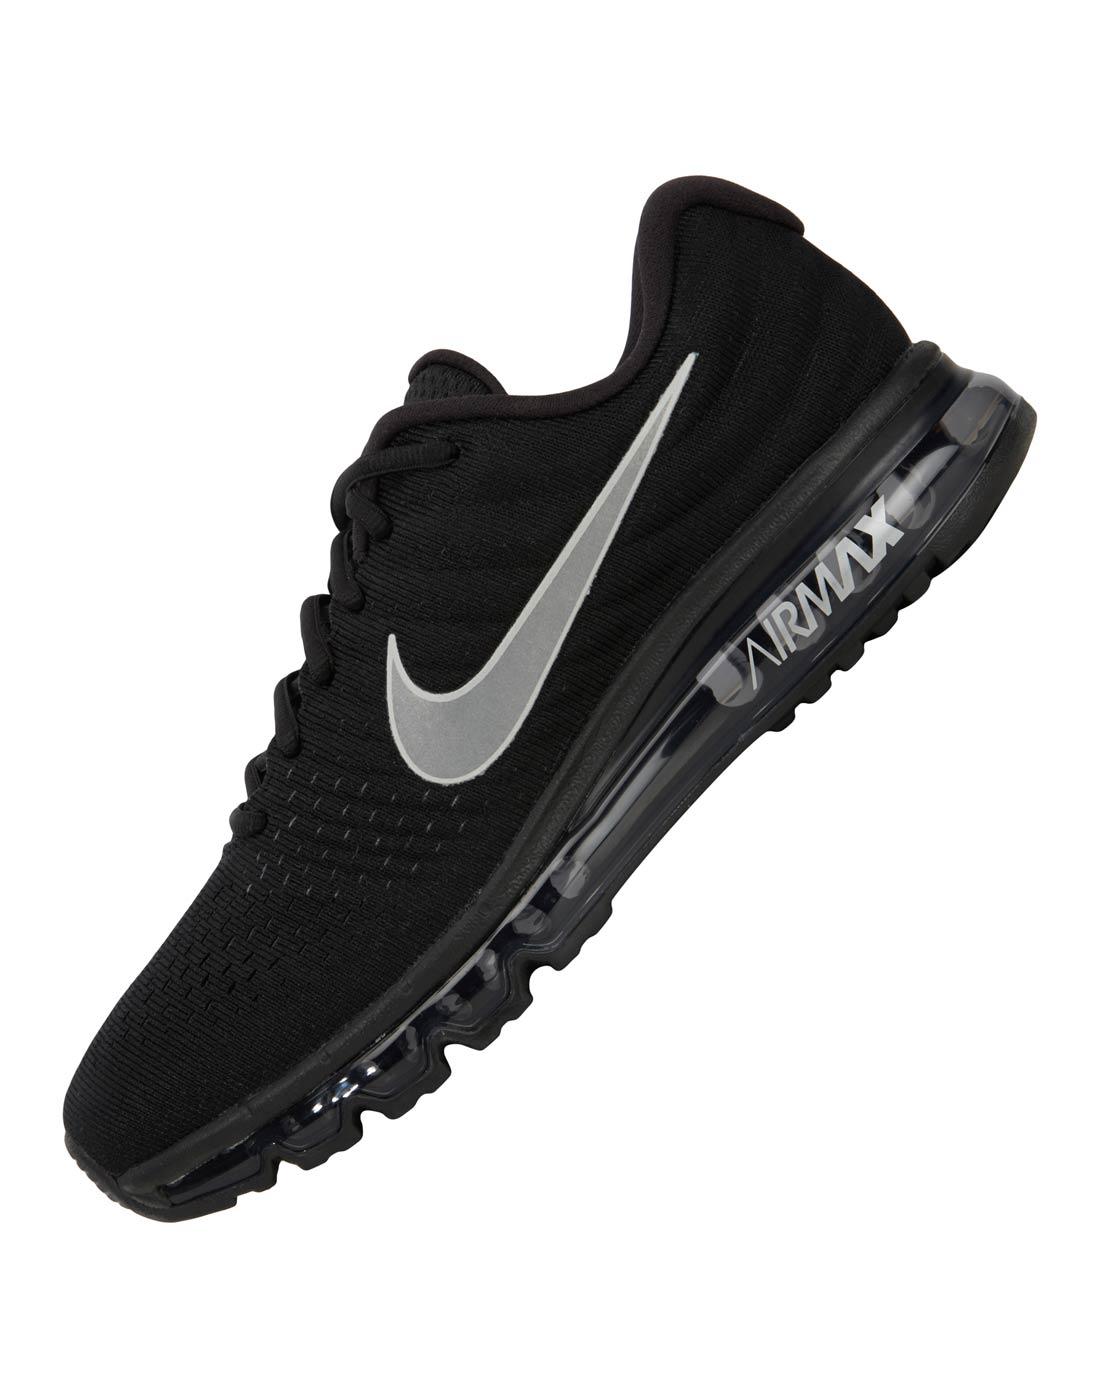 meet de129 e3259 Nike Mens Air Max 2017